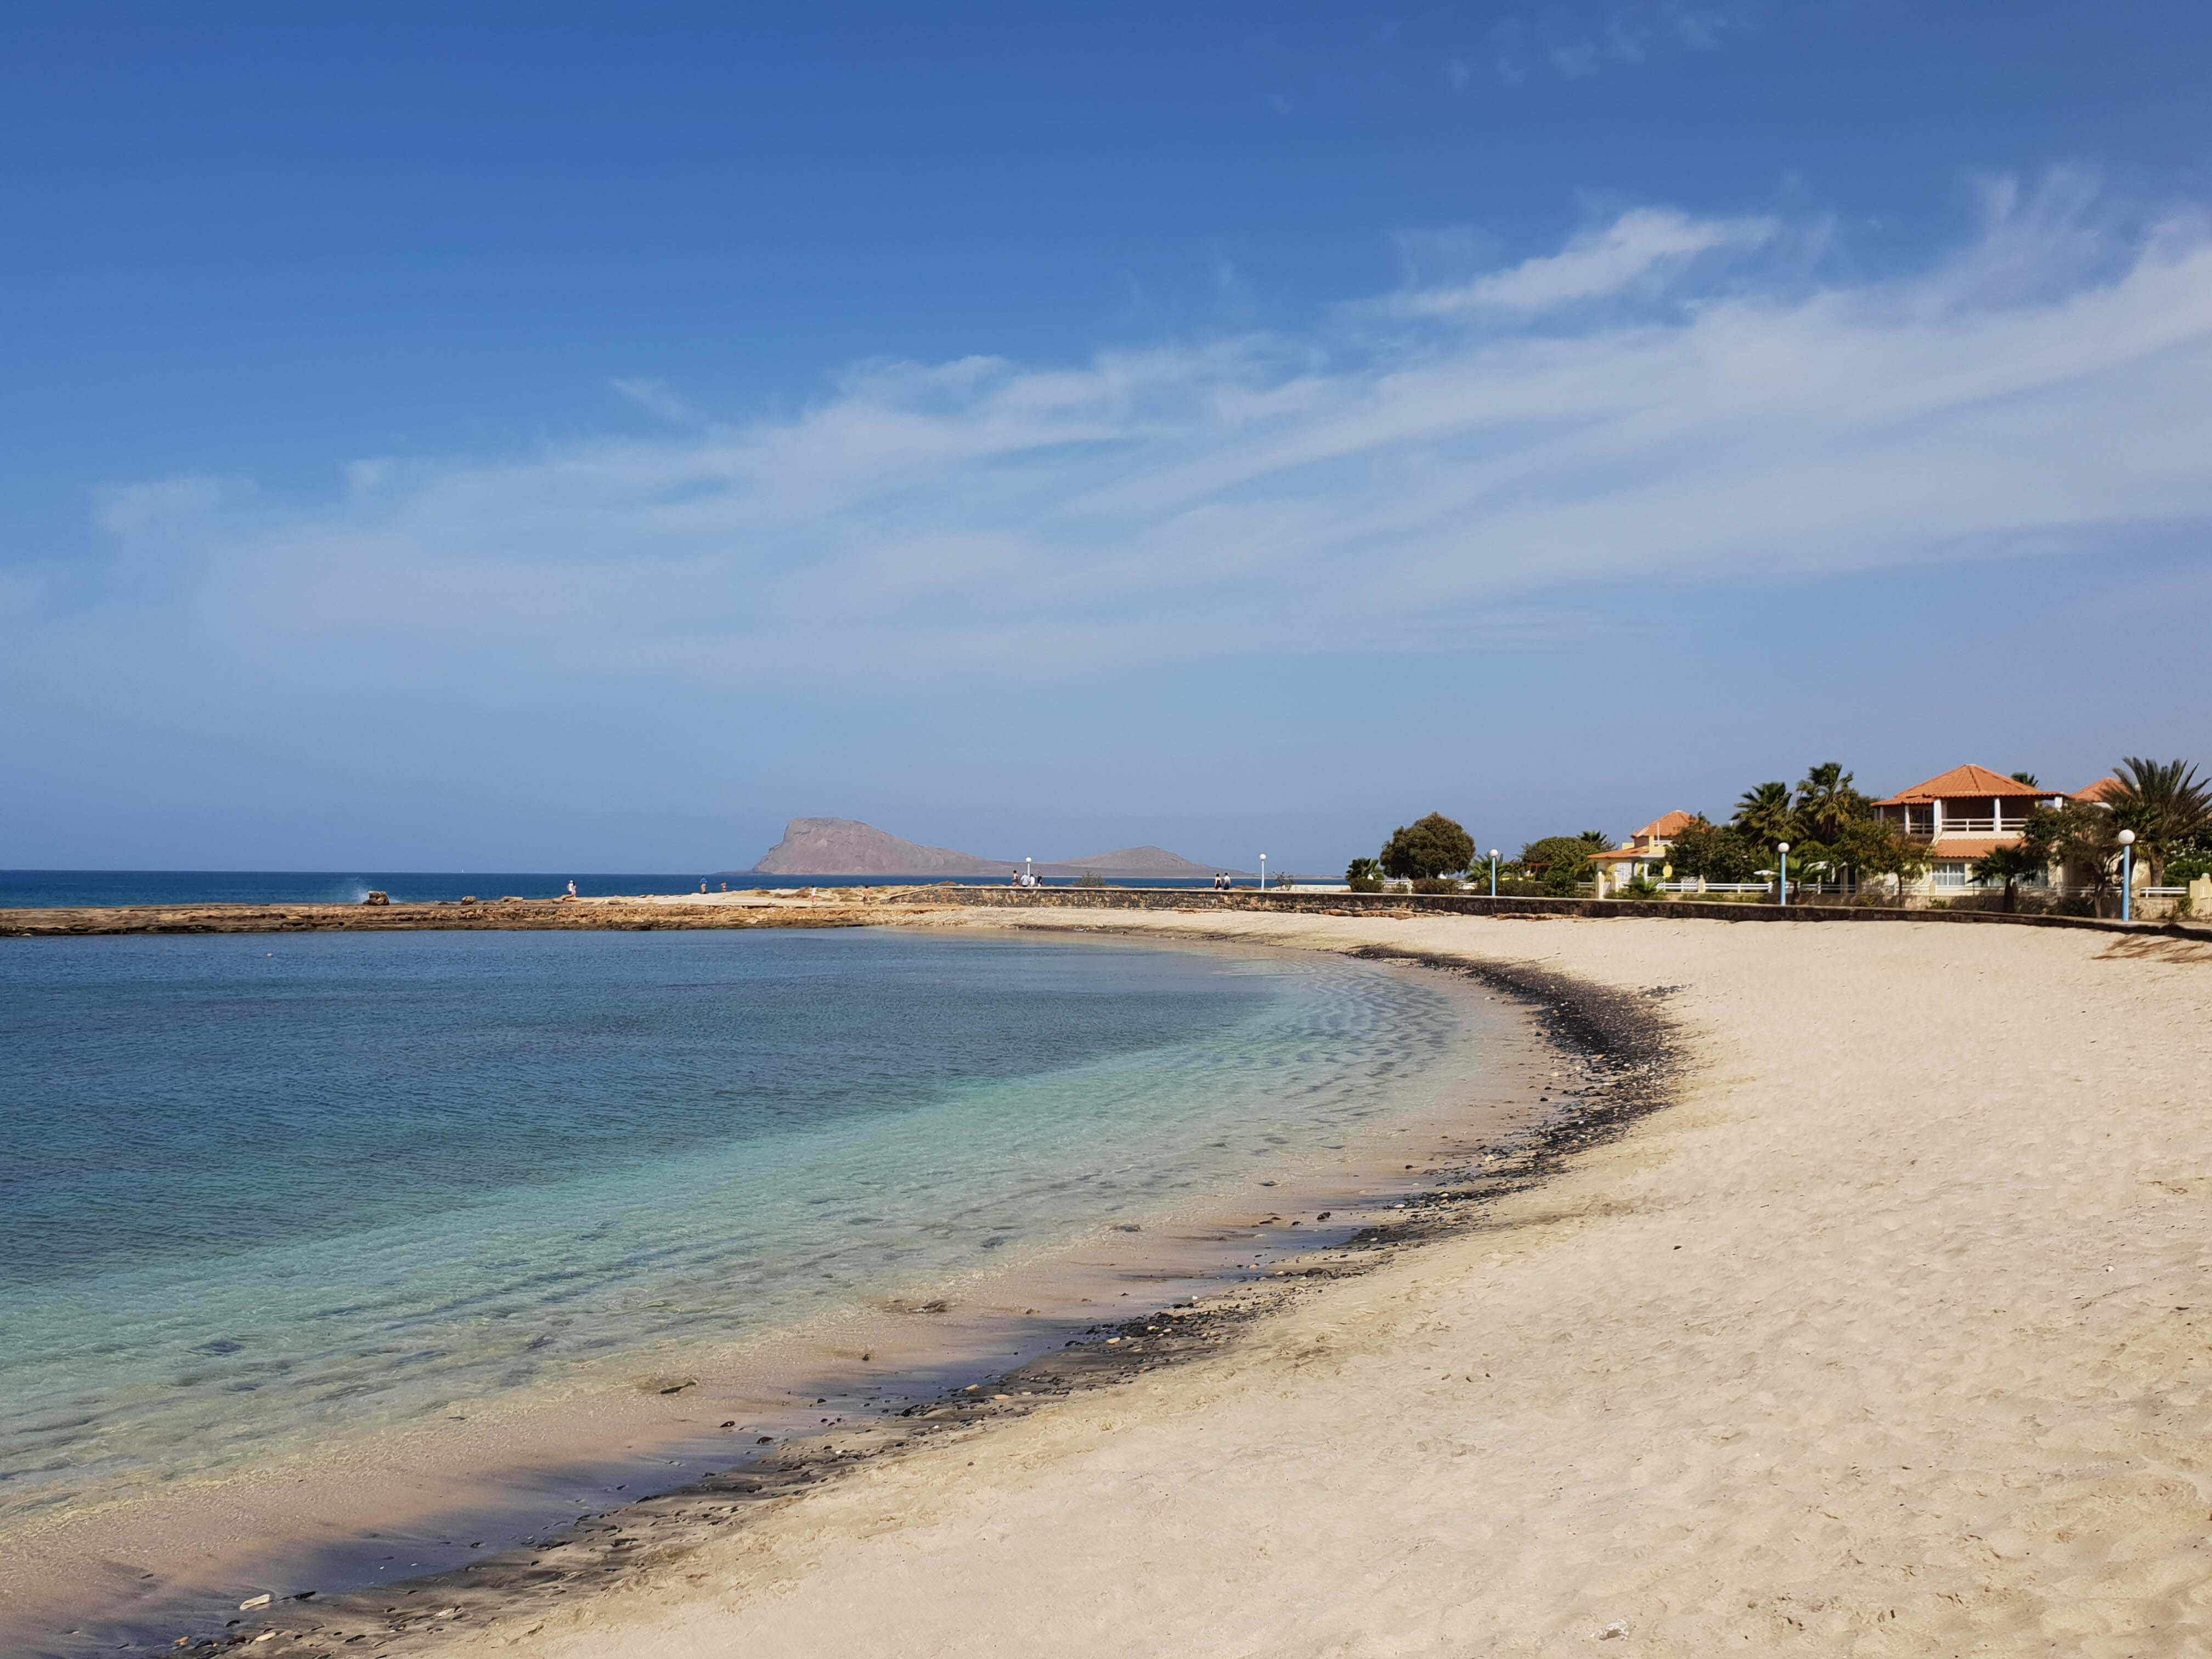 Vakantie Kaapverdië, ontdek één van de Kaapverdische eilanden